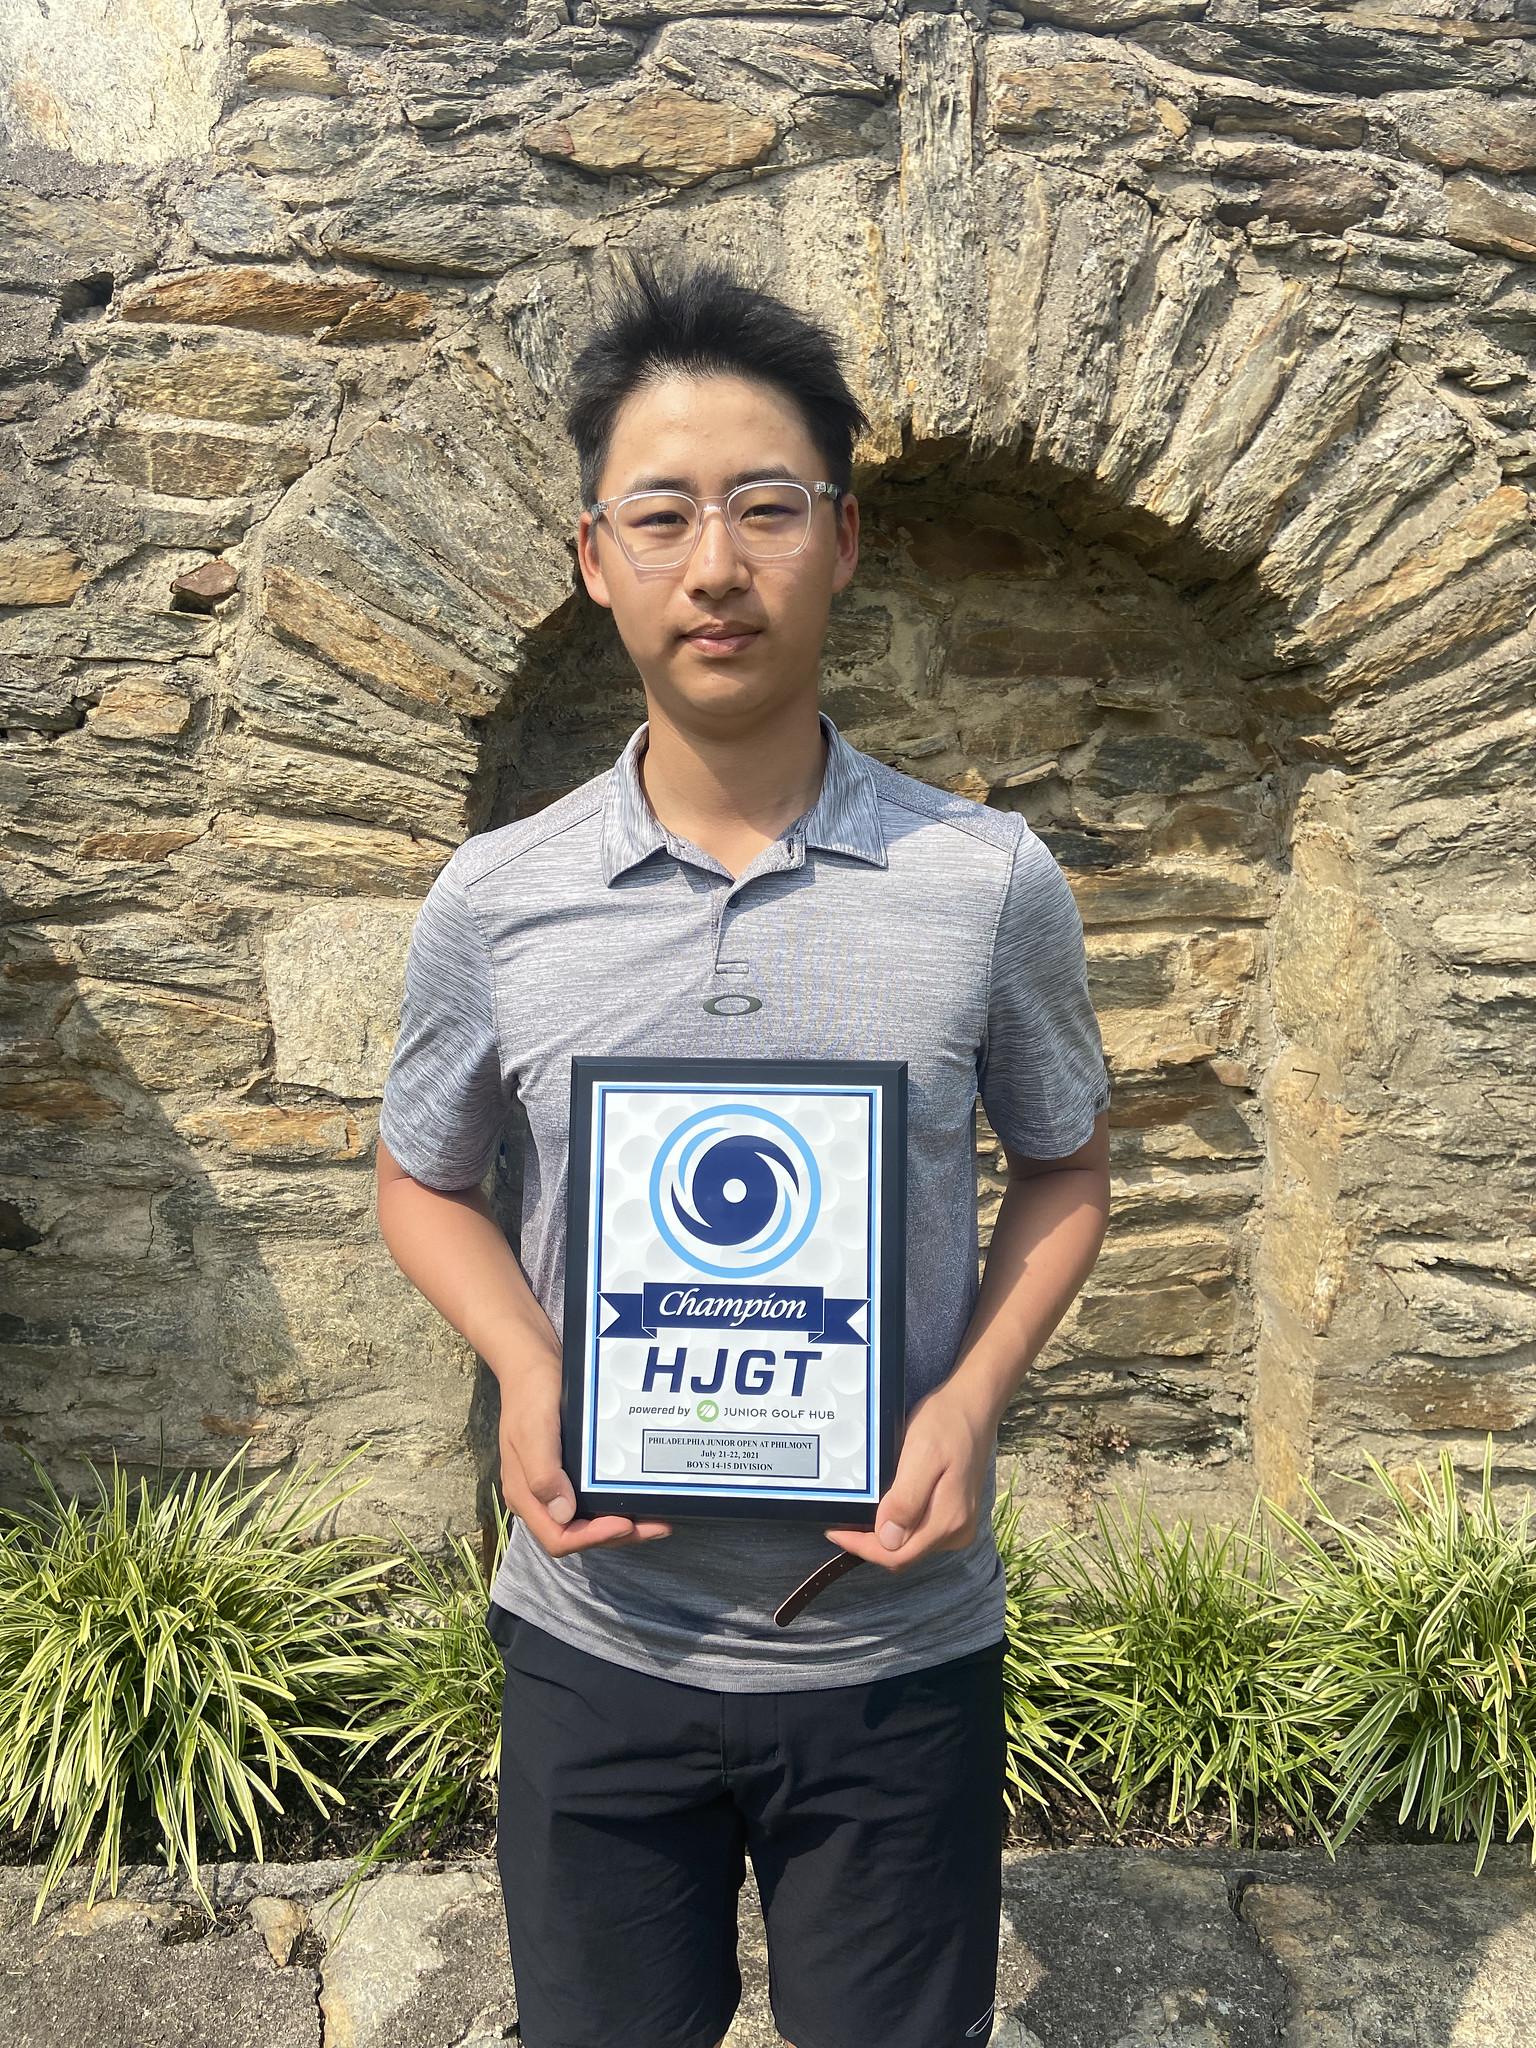 Philadelphia Junior Open at Philmont